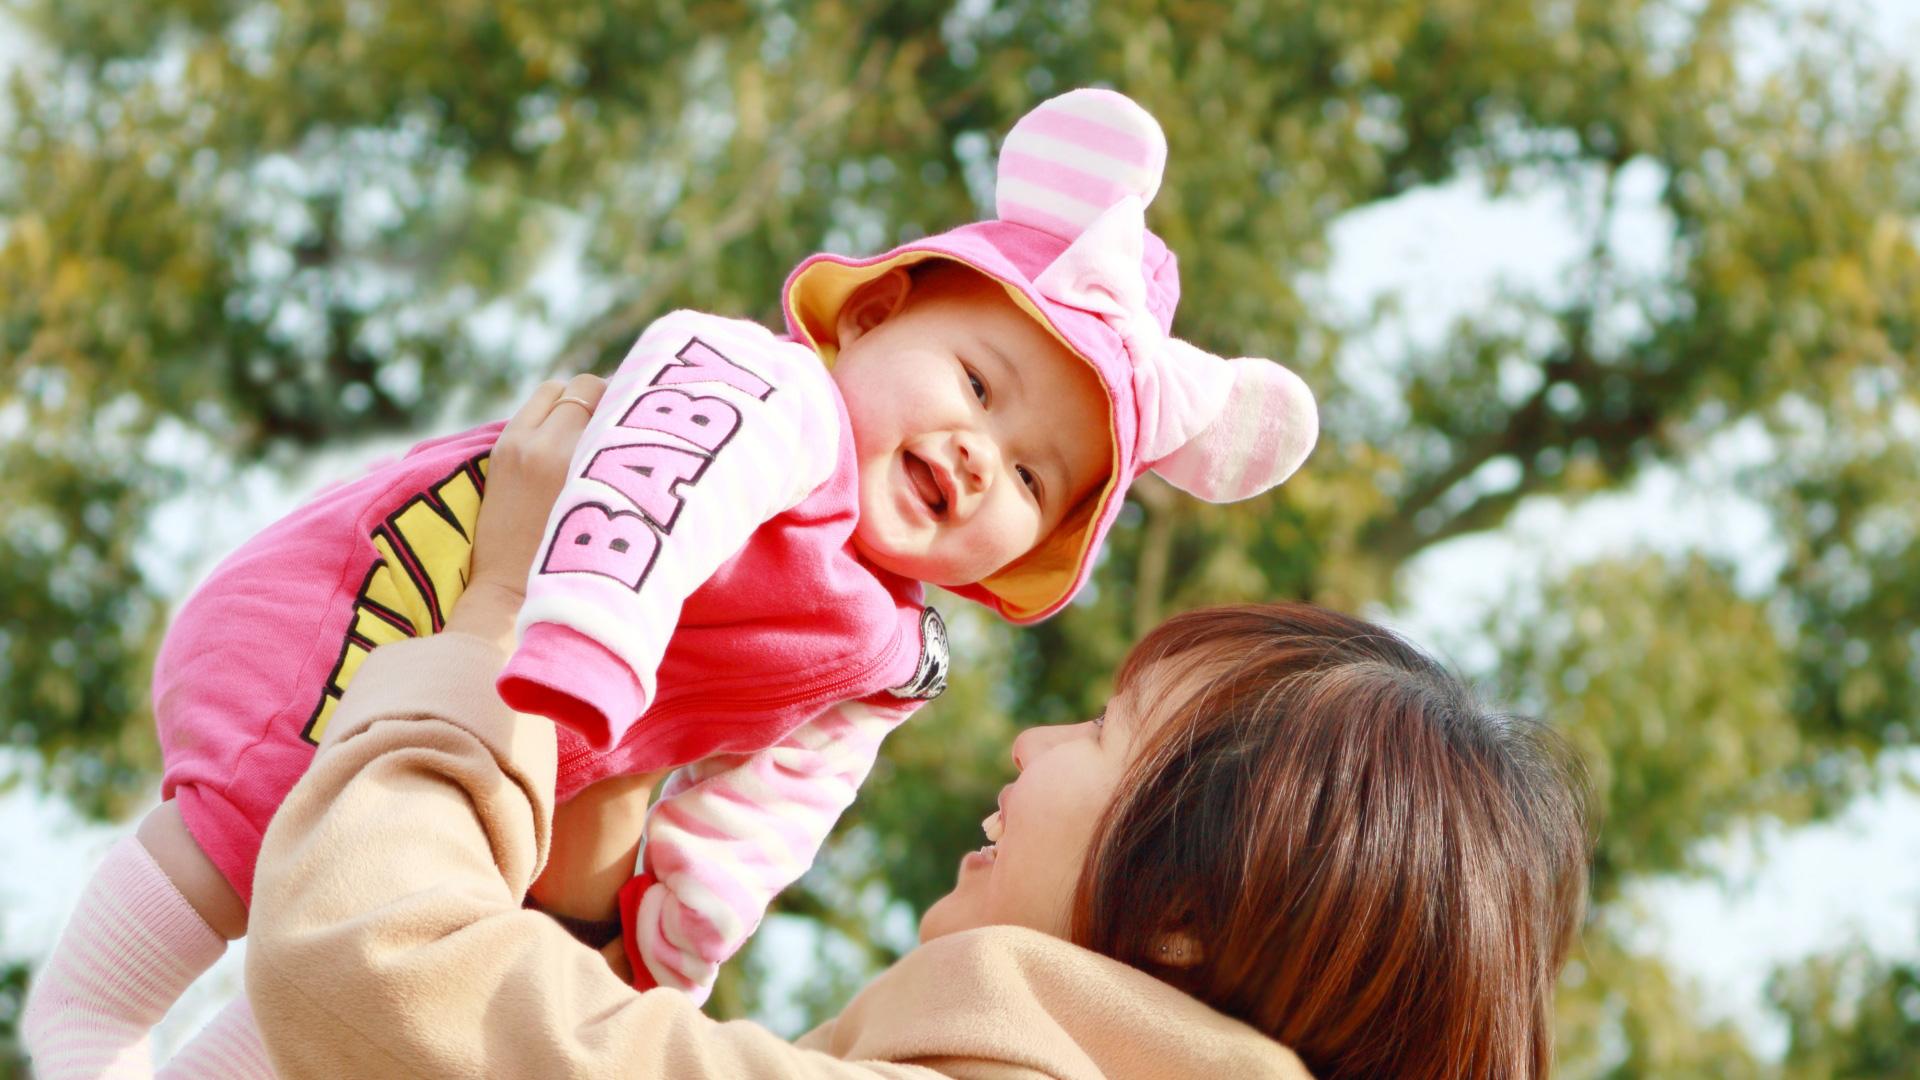 北海道育児支援協会「ホクイク」